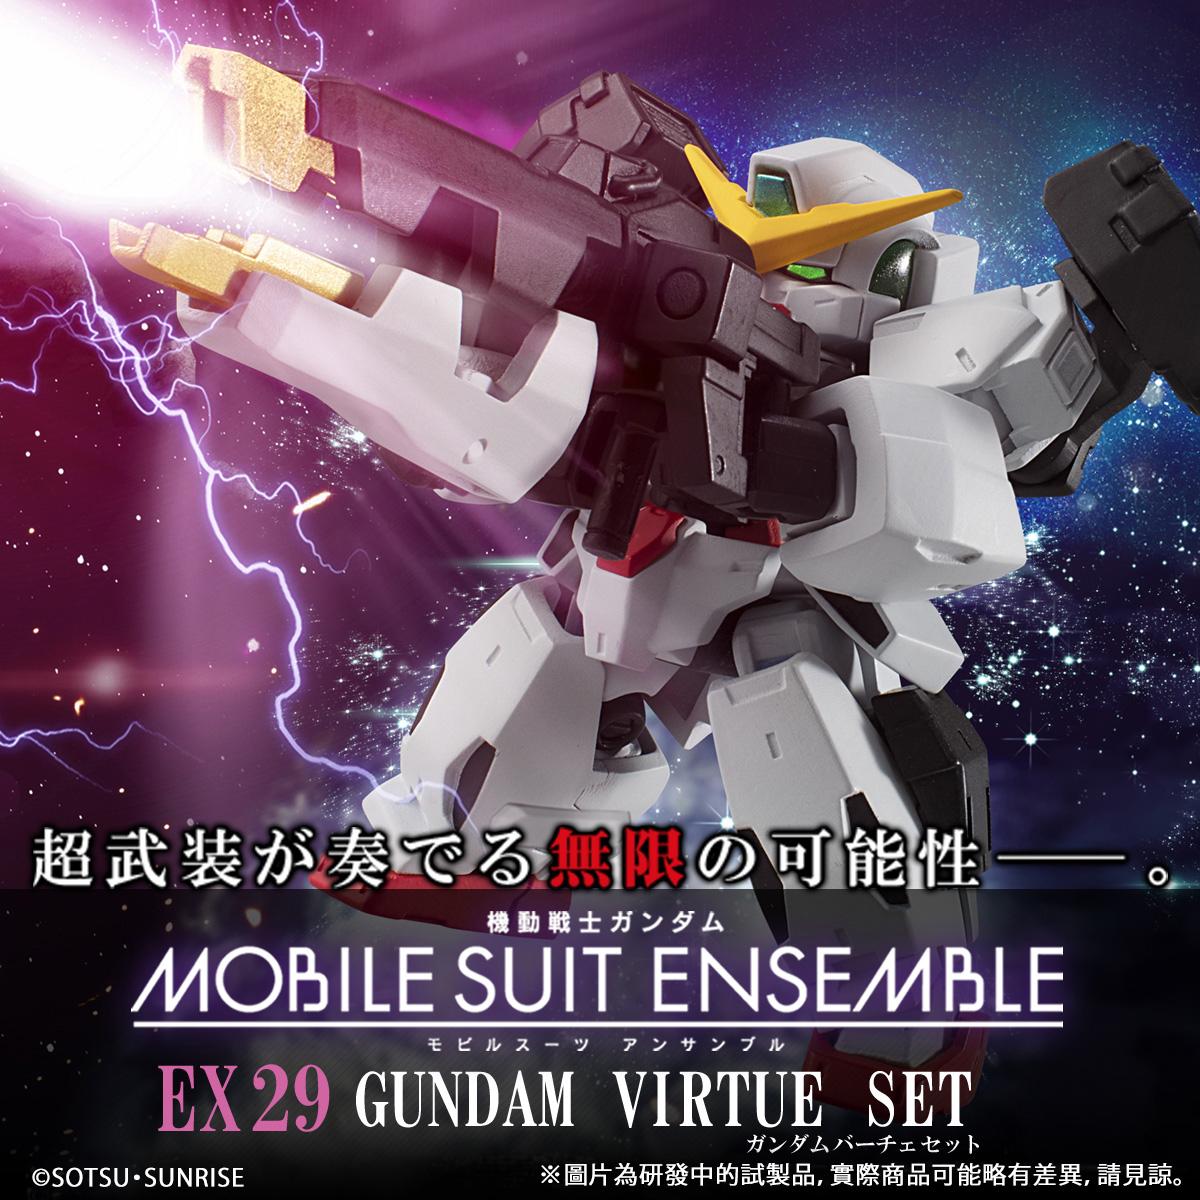 MOBILE SUIT ENSEMBLE EX29 GUNDAM VIRTUE SET